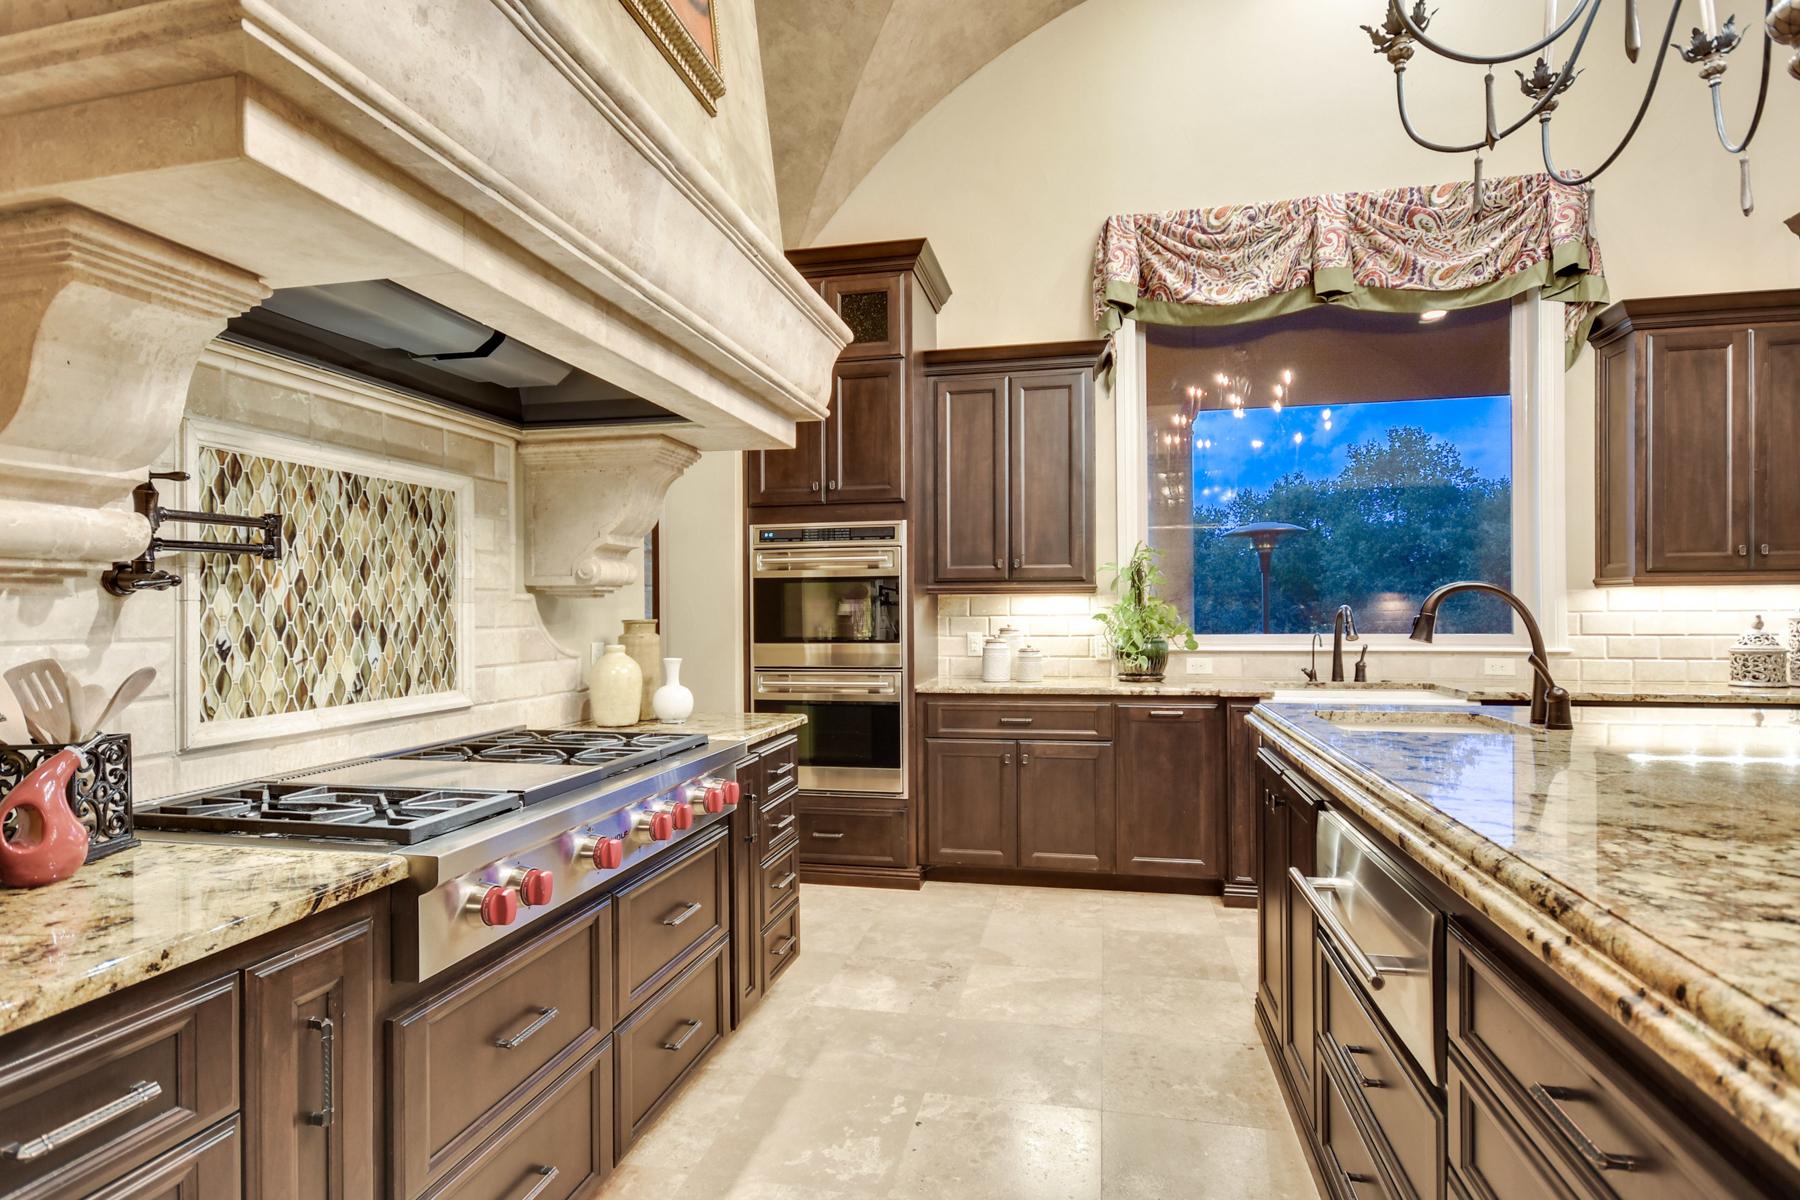 Additional photo for property listing at Breathtaking Estate in Greystone Estates 19418 Settlers Crk San Antonio, Texas 78258 Estados Unidos